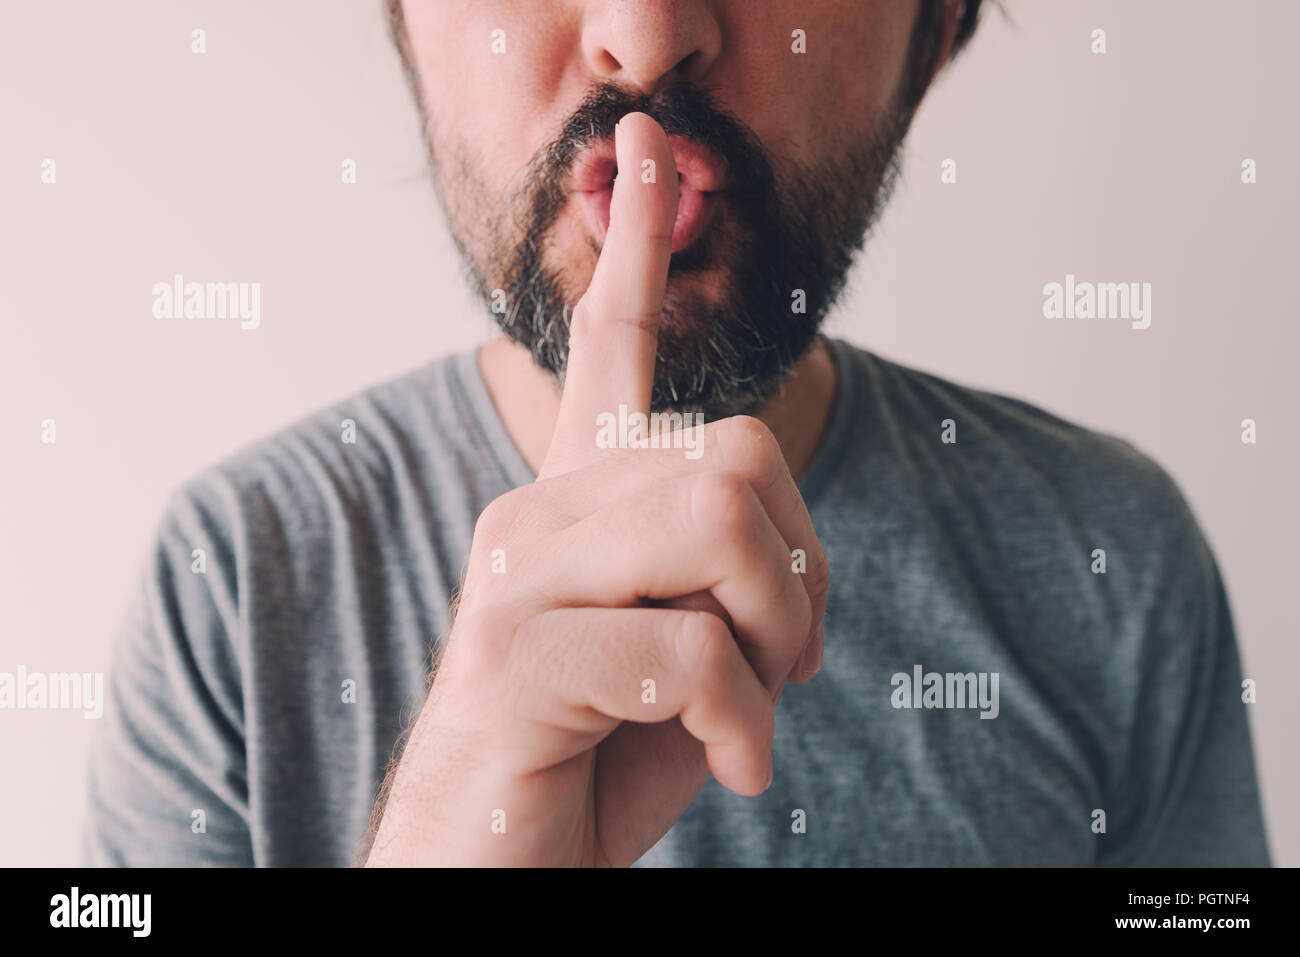 Finger on lips, man making a shushing gesture - Stock Image